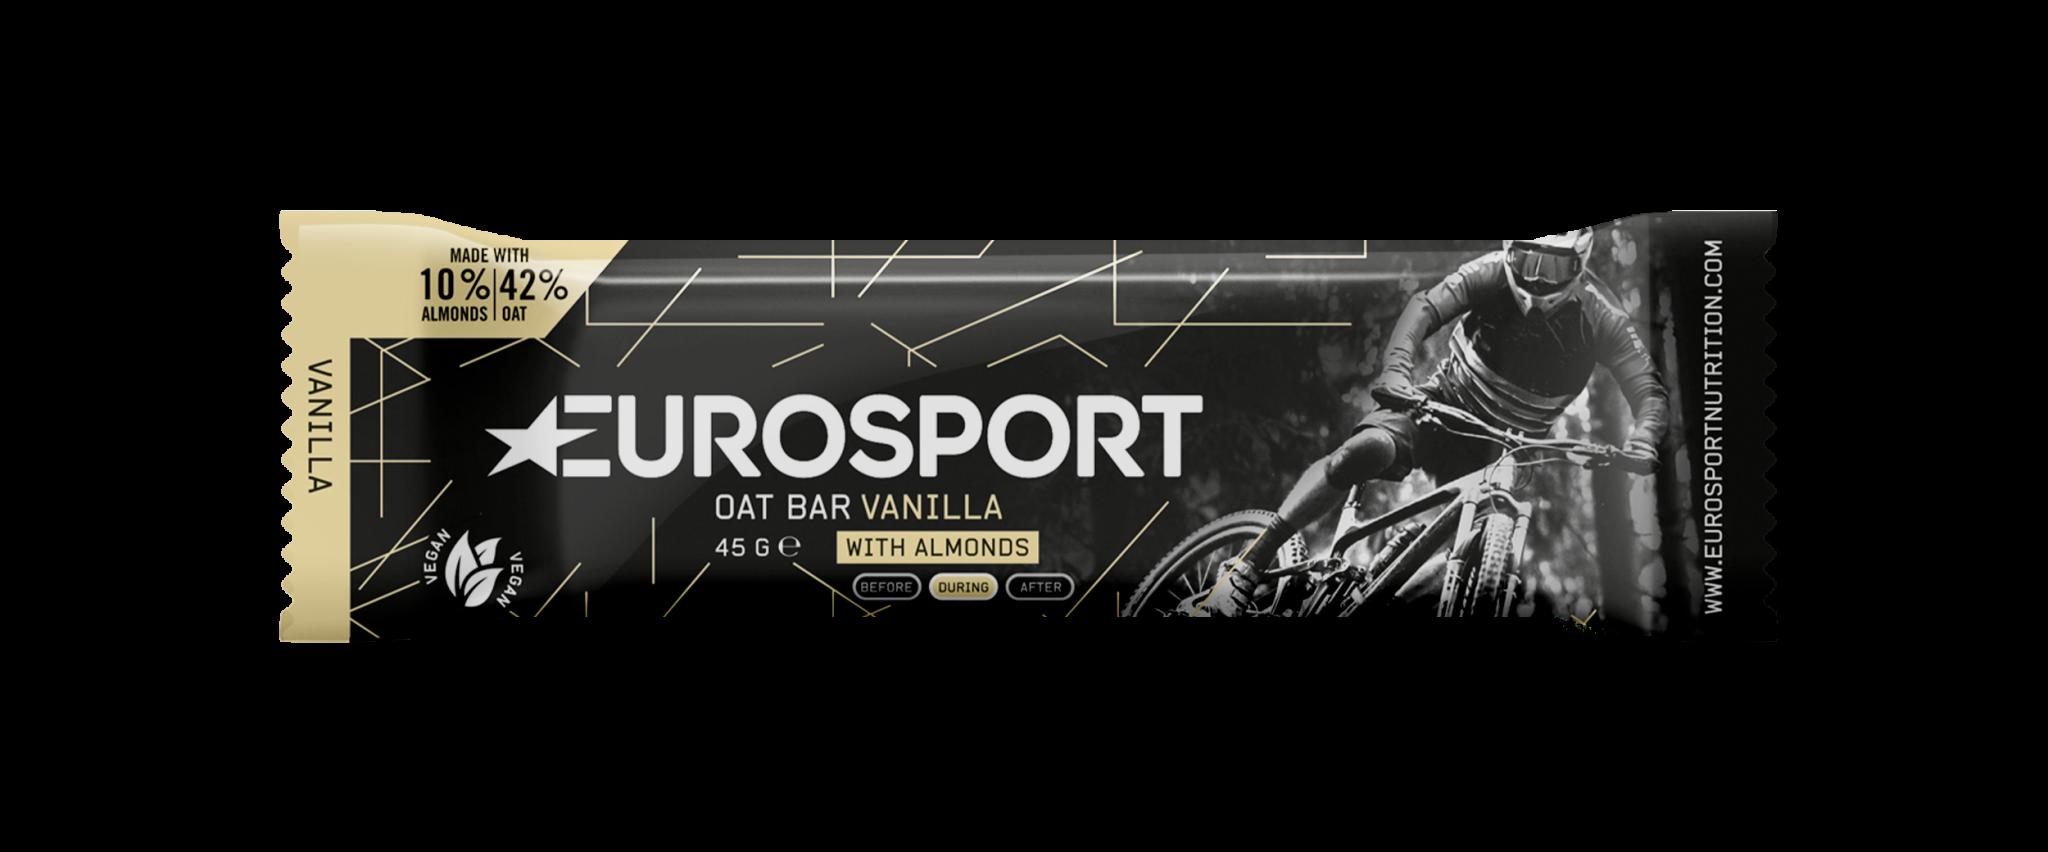 Eurosport - Oat Bar Vanilla - Reep - 3D(1)